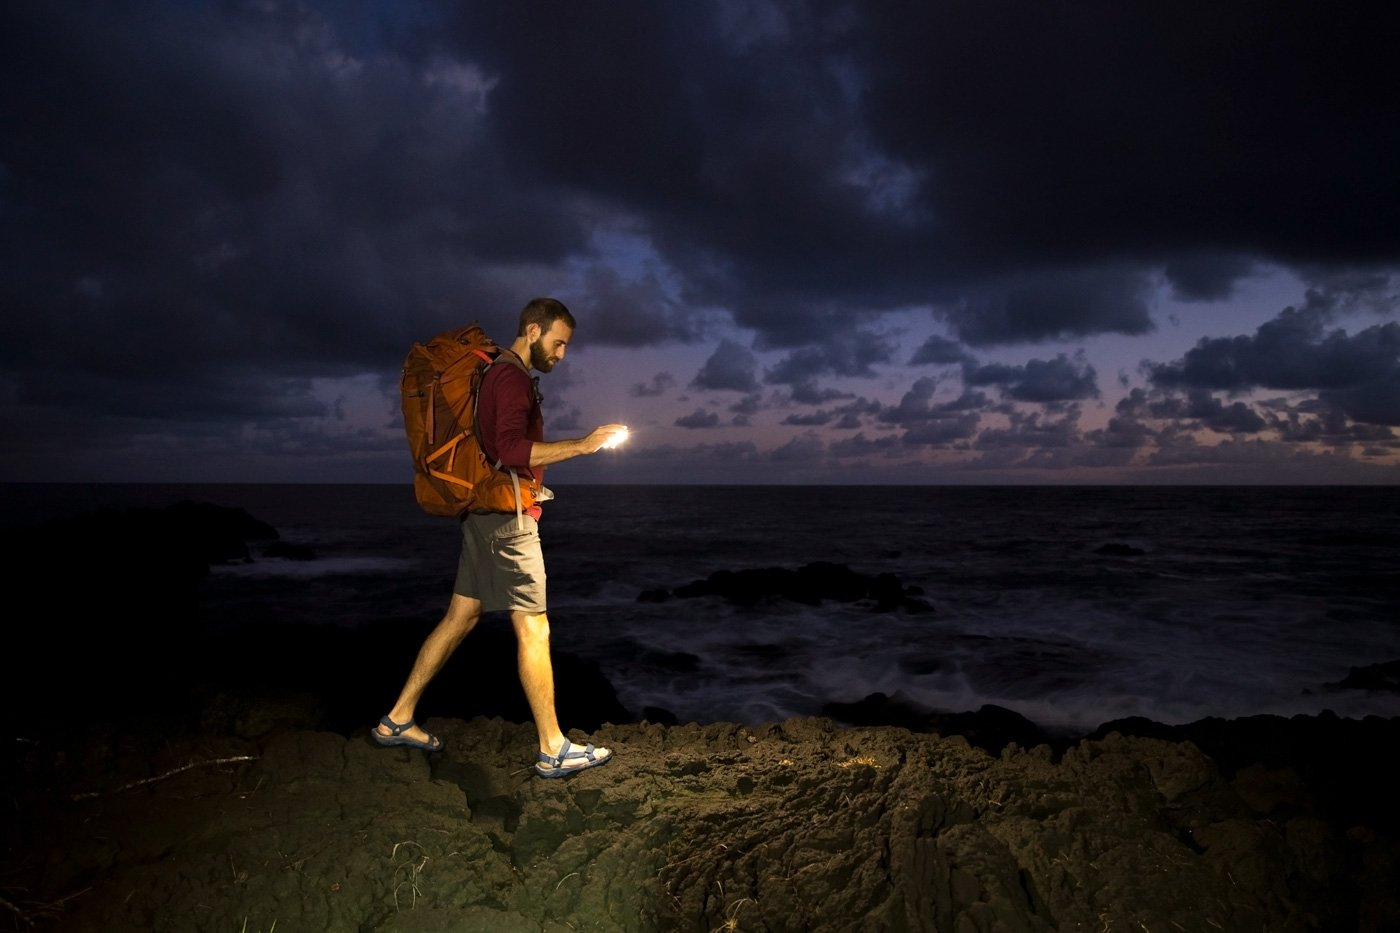 BioLite Sunlight Solar Powered Lantern, Grey by BioLite (Image #7)